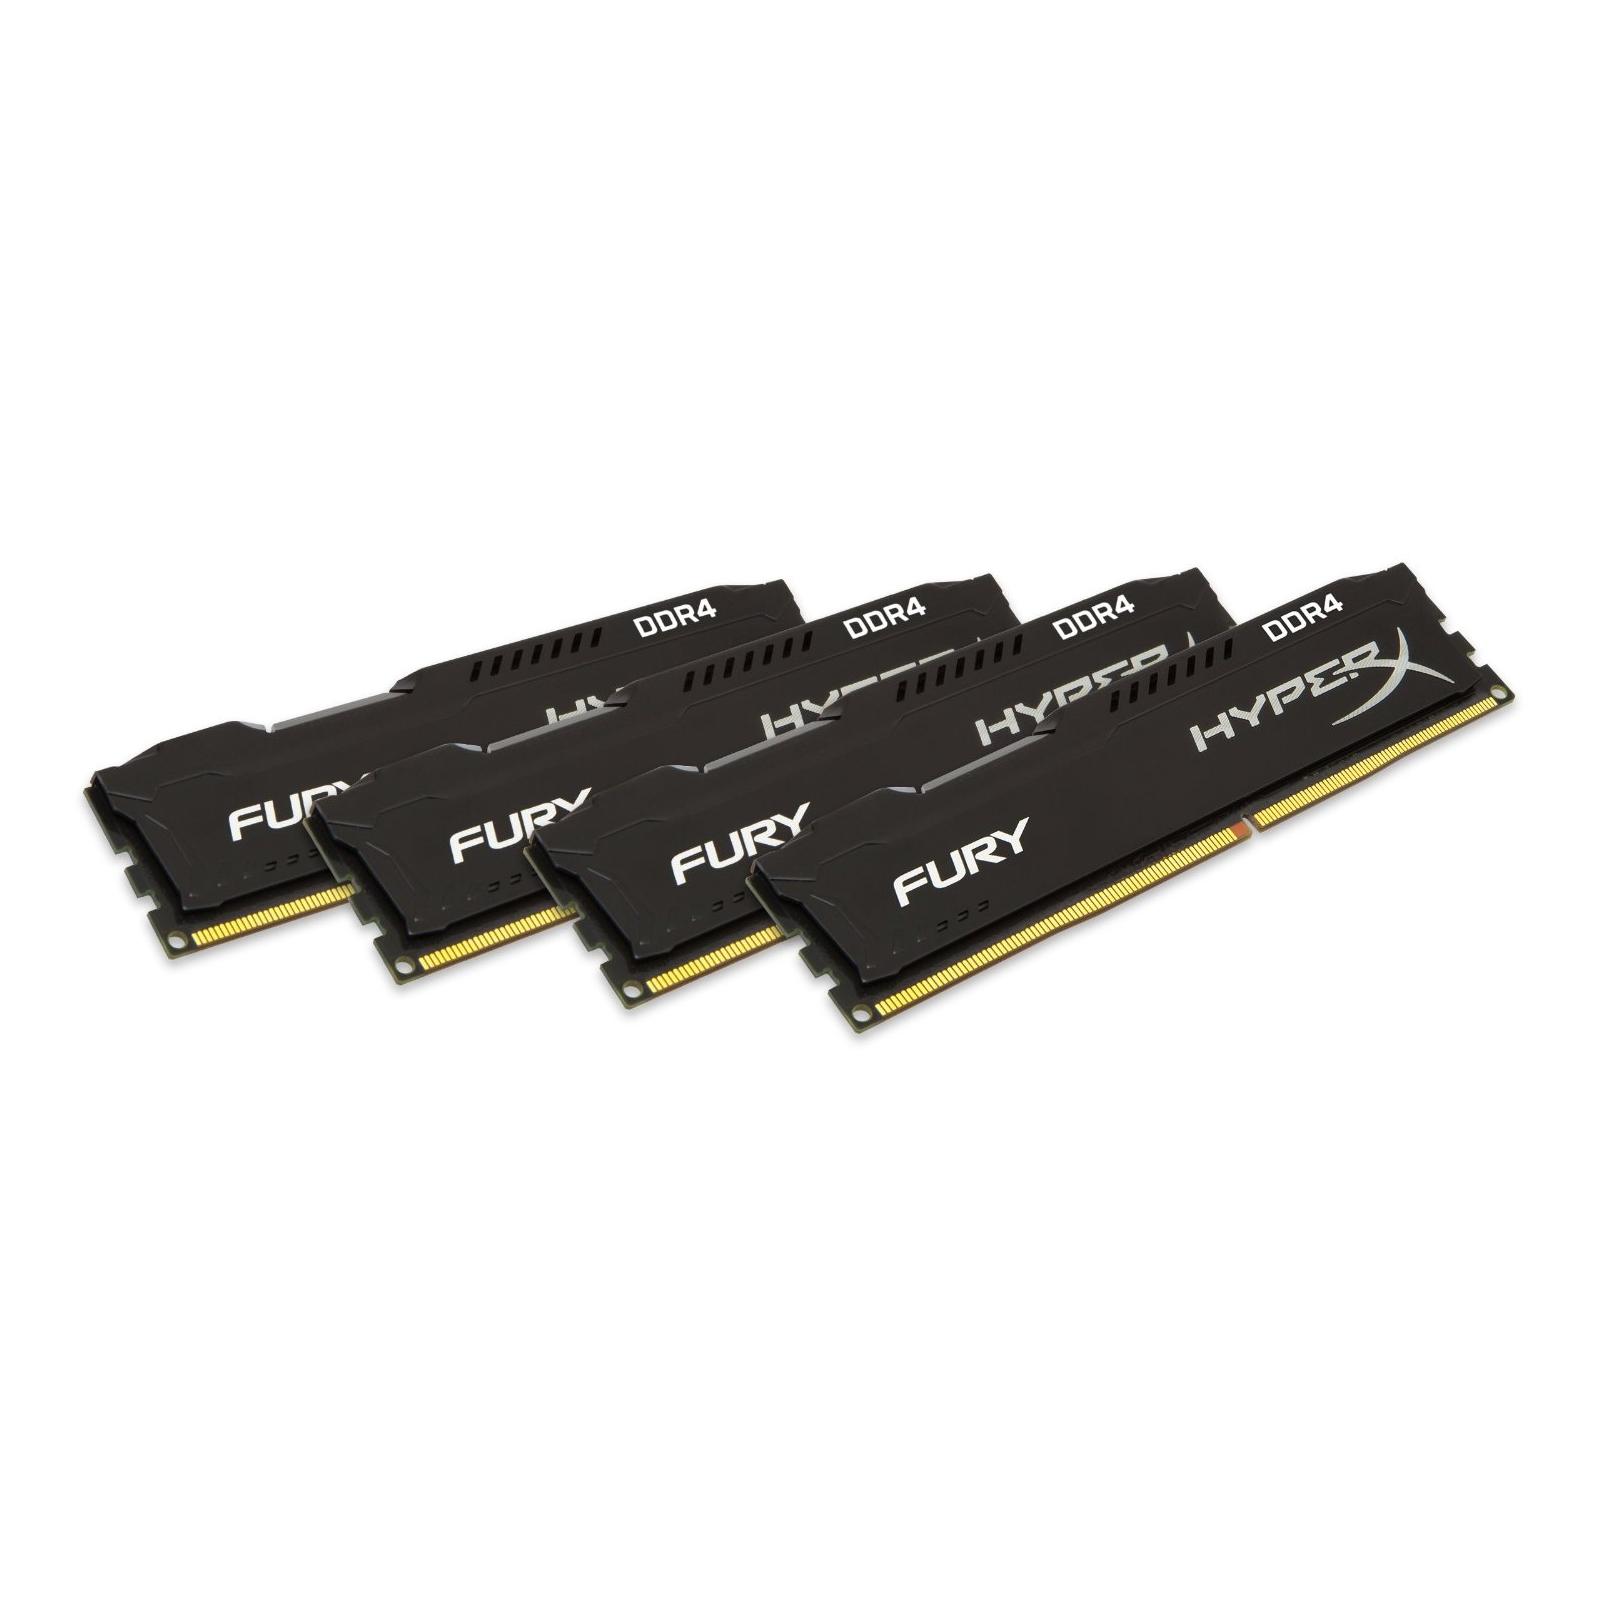 Модуль памяти для компьютера DDR4 64GB (4x16GB) 2400 MHz HyperX FURY Black Kingston (HX424C15FBK4/64) изображение 2